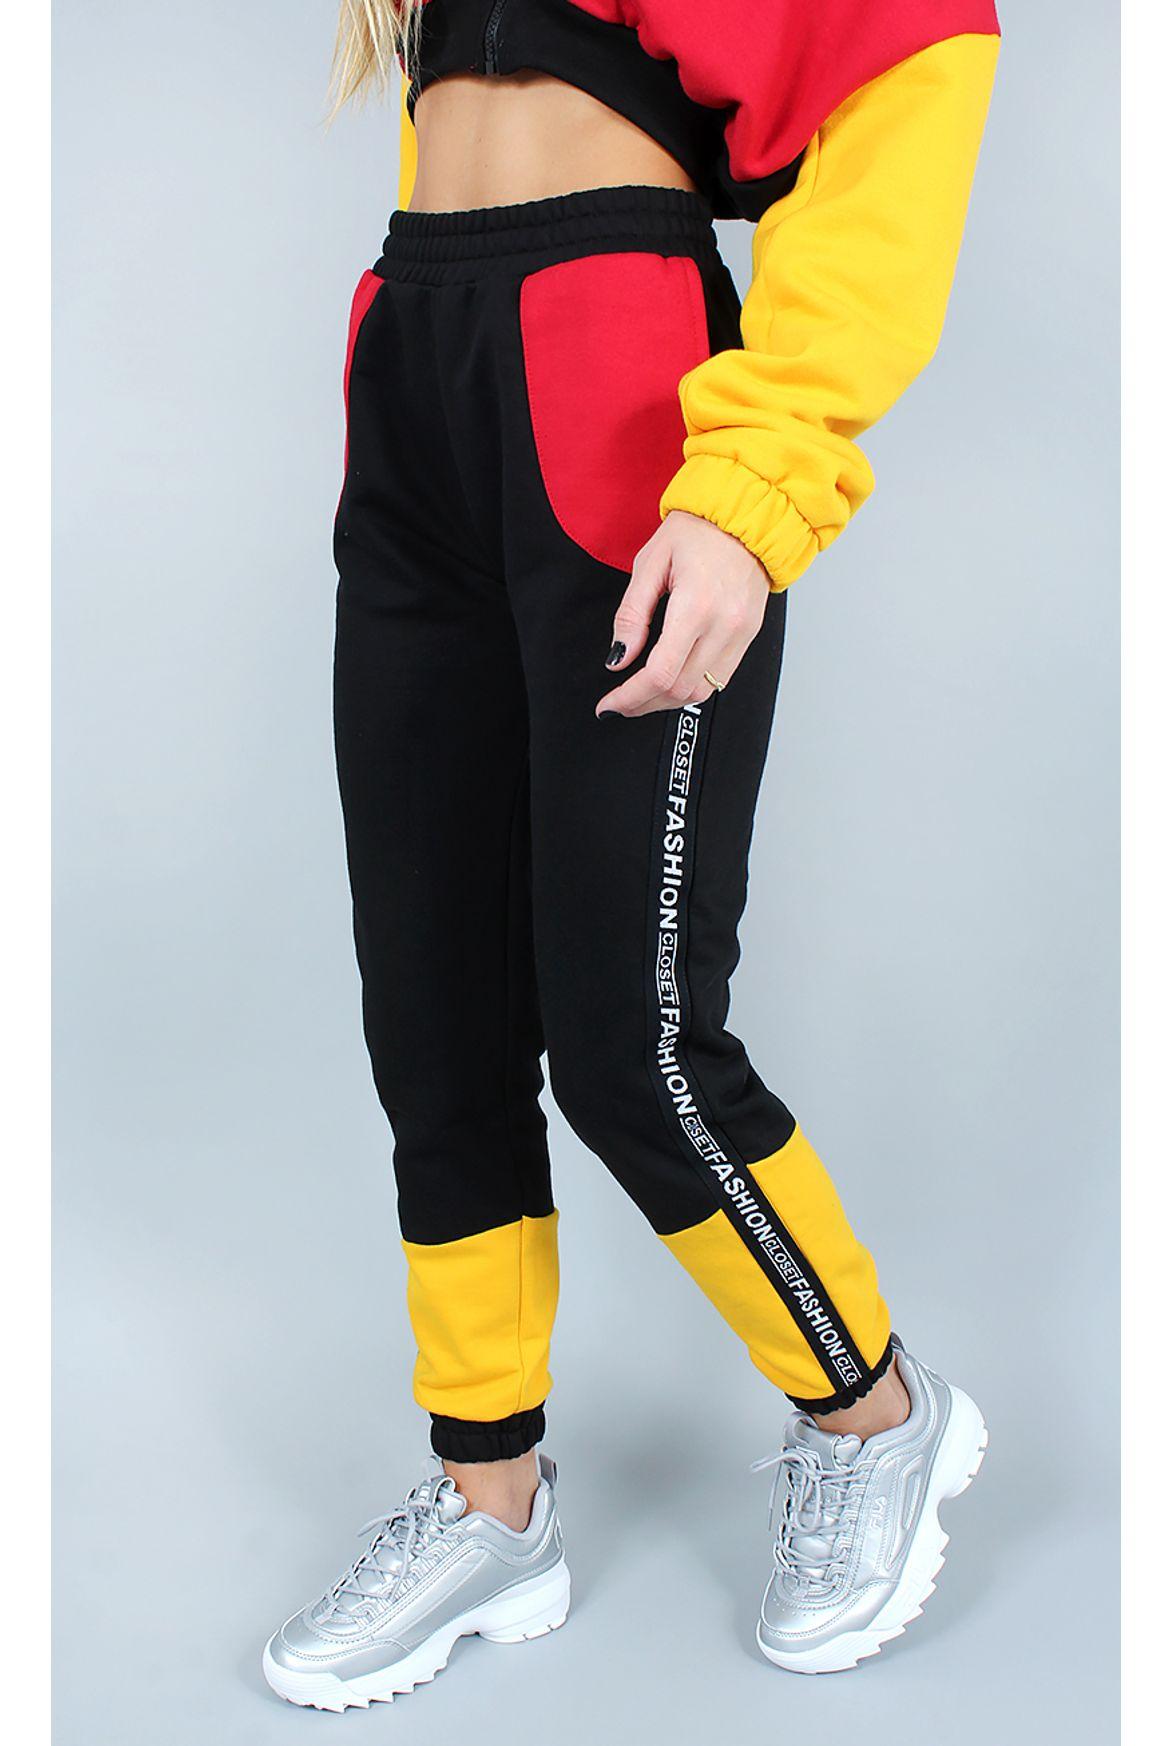 793836b1174 FSHN calça moletom fashion colors preto - Fashion Closet